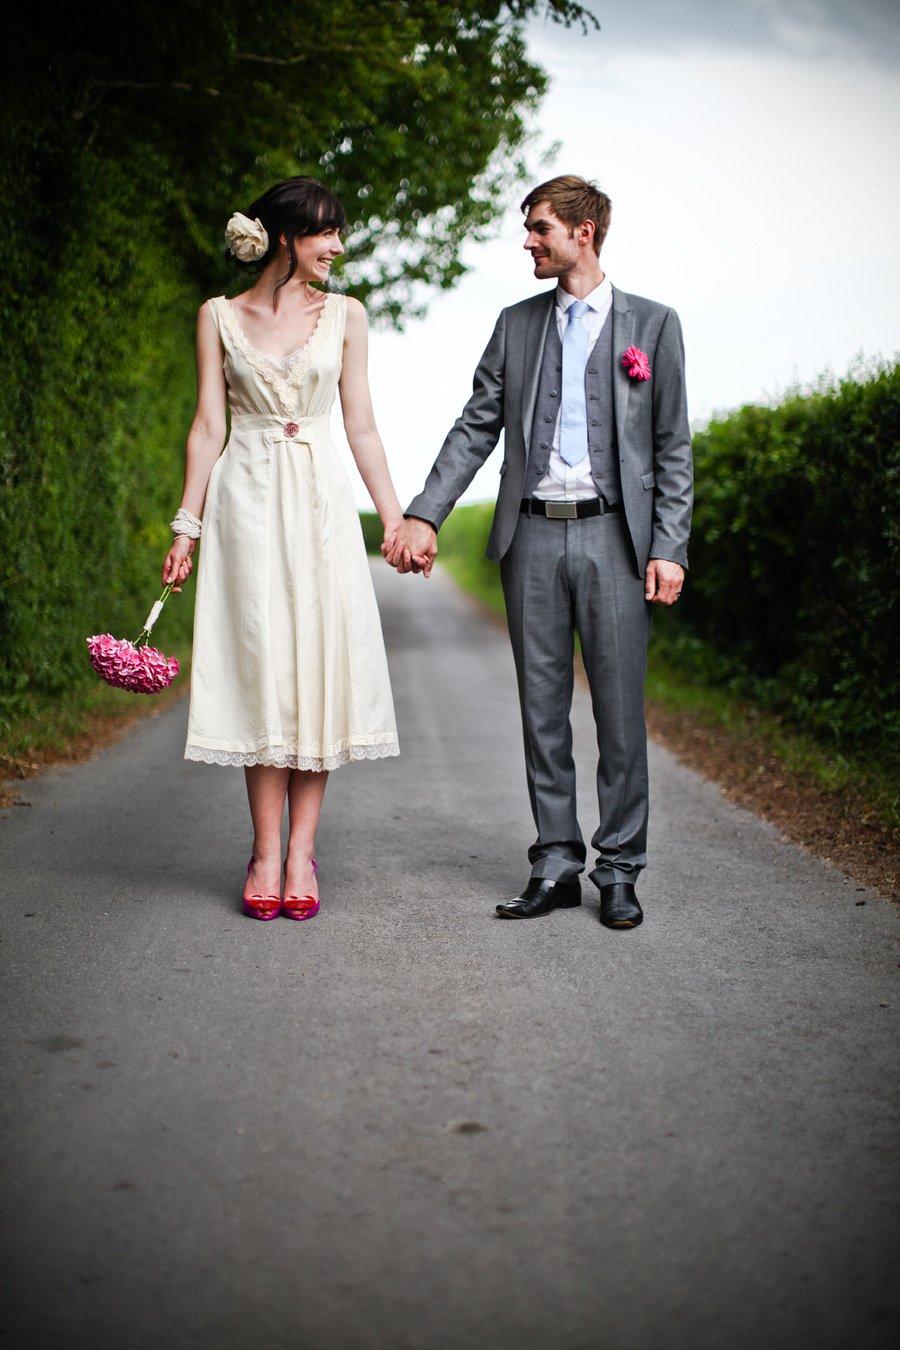 Berkshire-Wedding-Photography-Fazackarley-Aisling-and-Philip-29